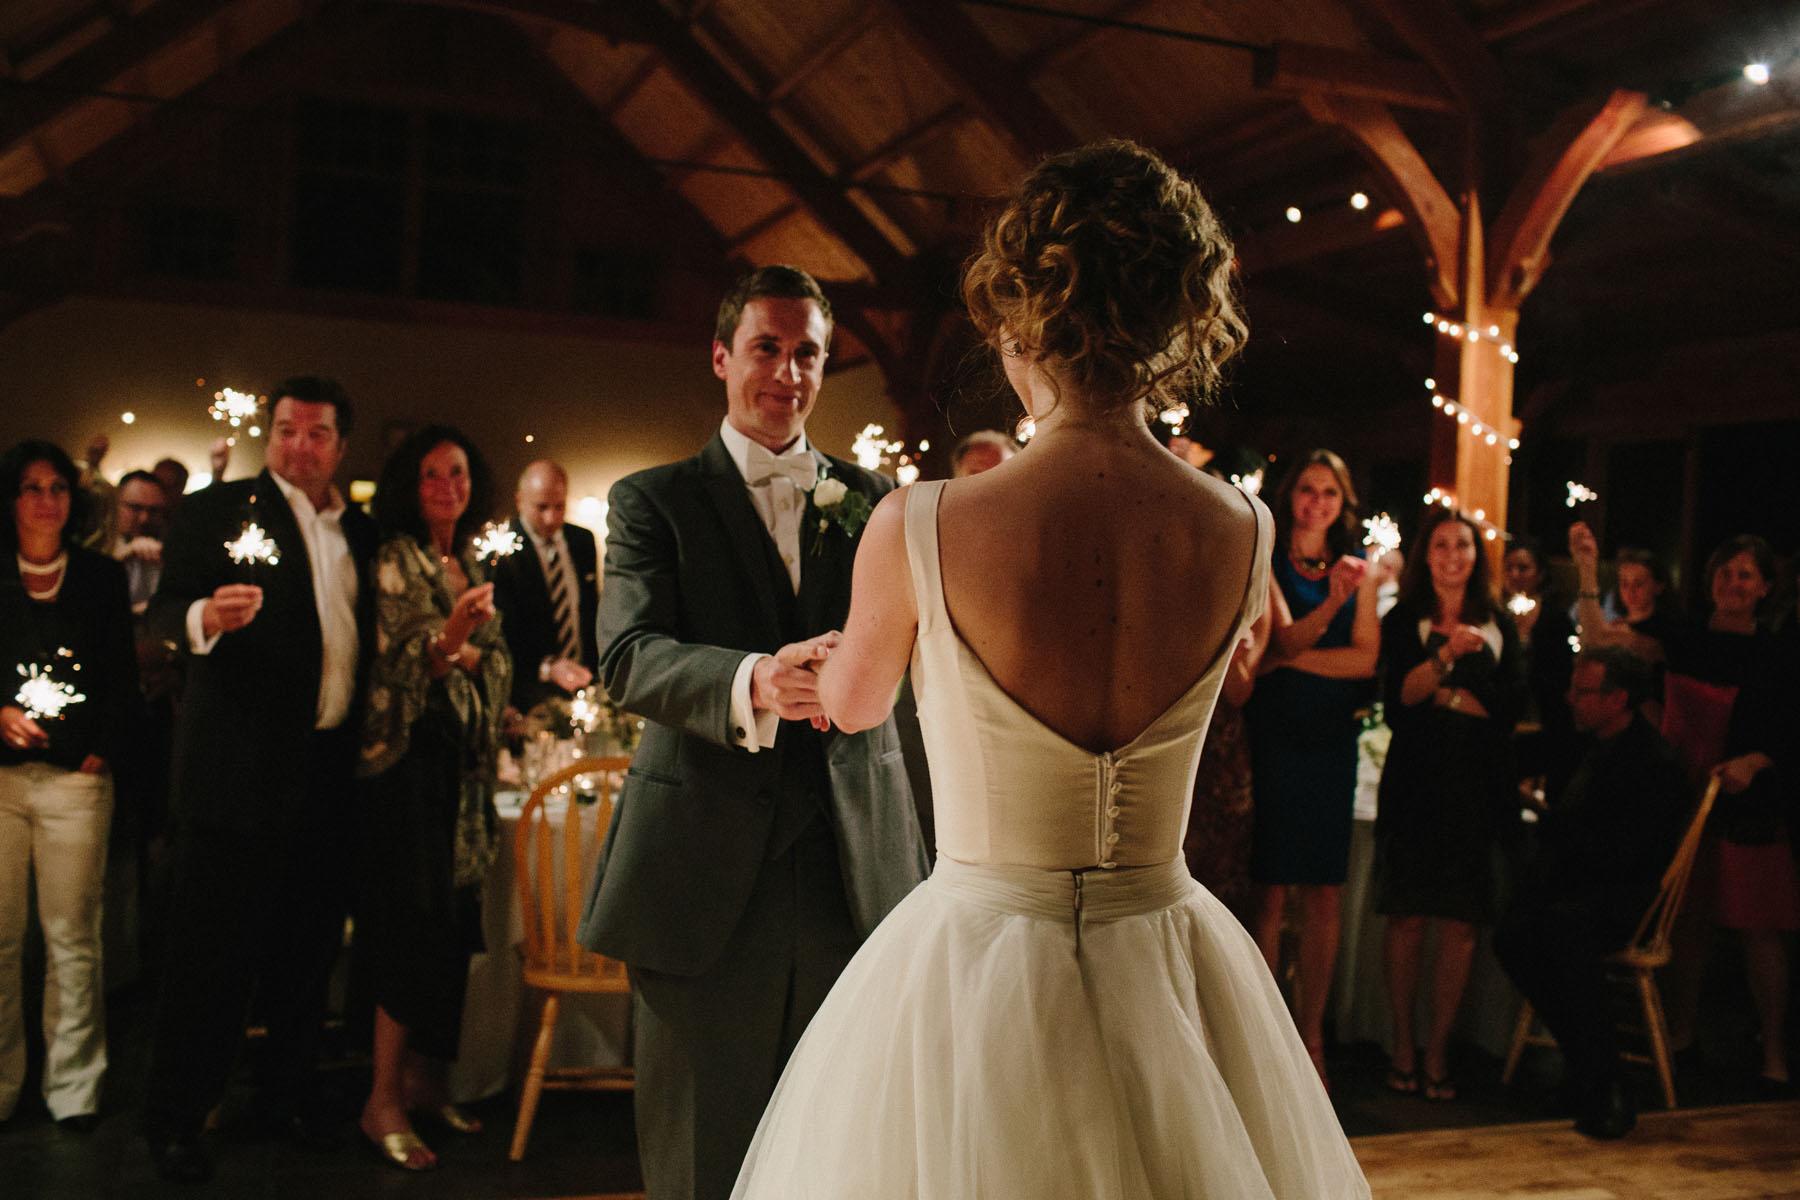 thetis-island-wedding-photographer-rp-rn-200.jpg